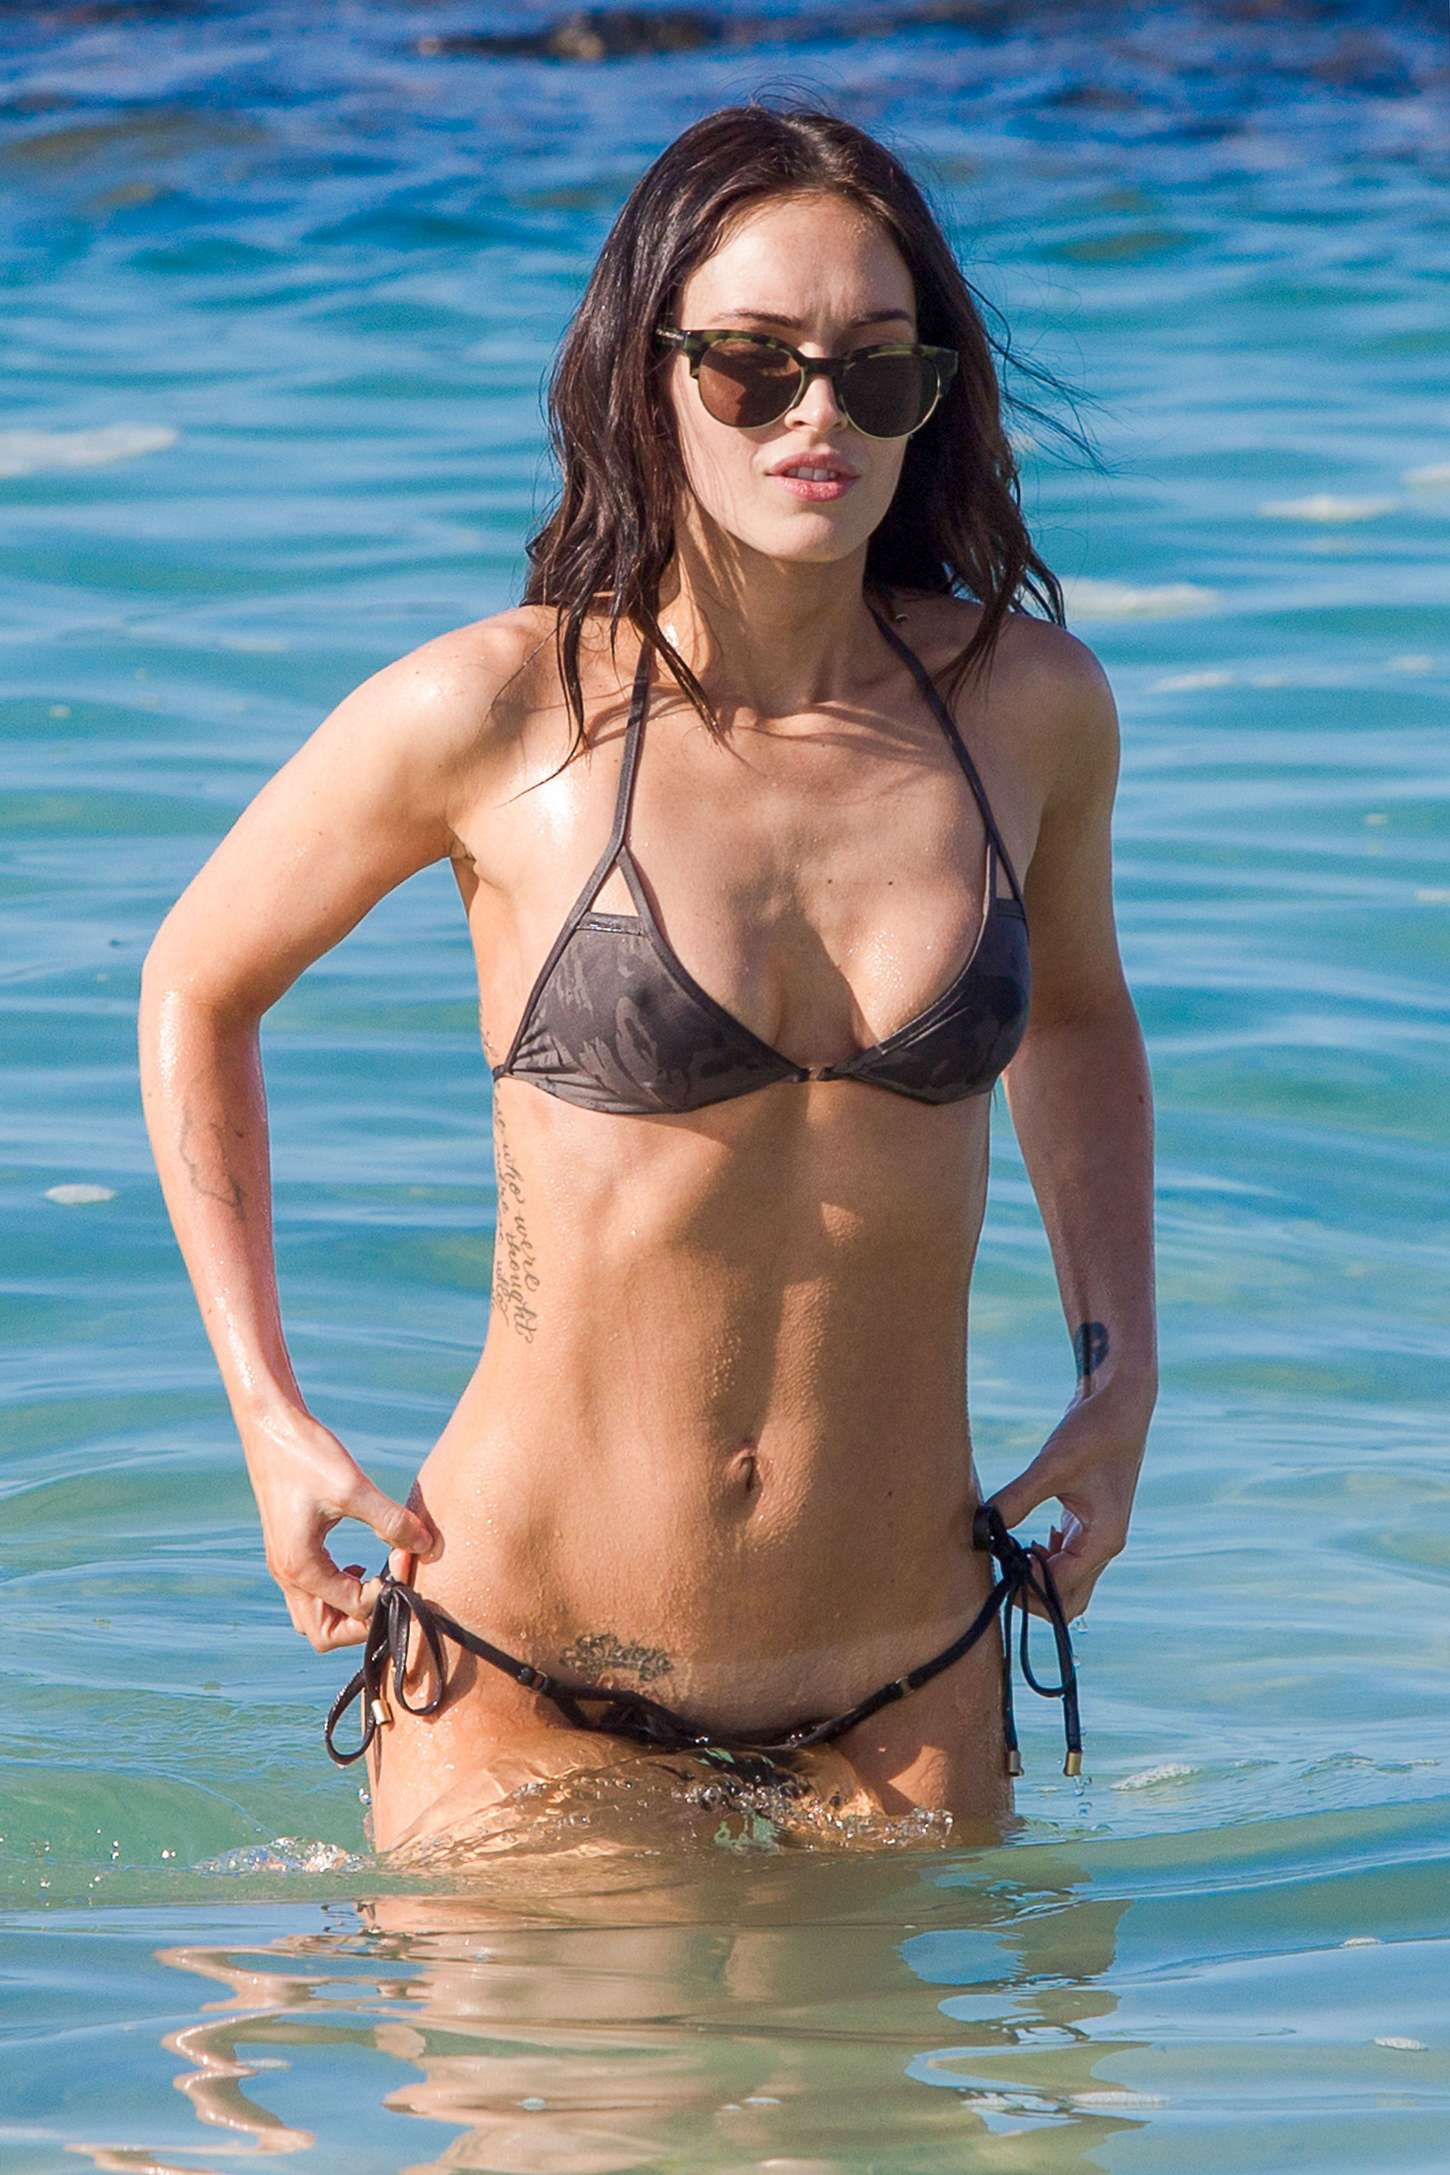 Megan-Fox-in-Bikini--26.jpg